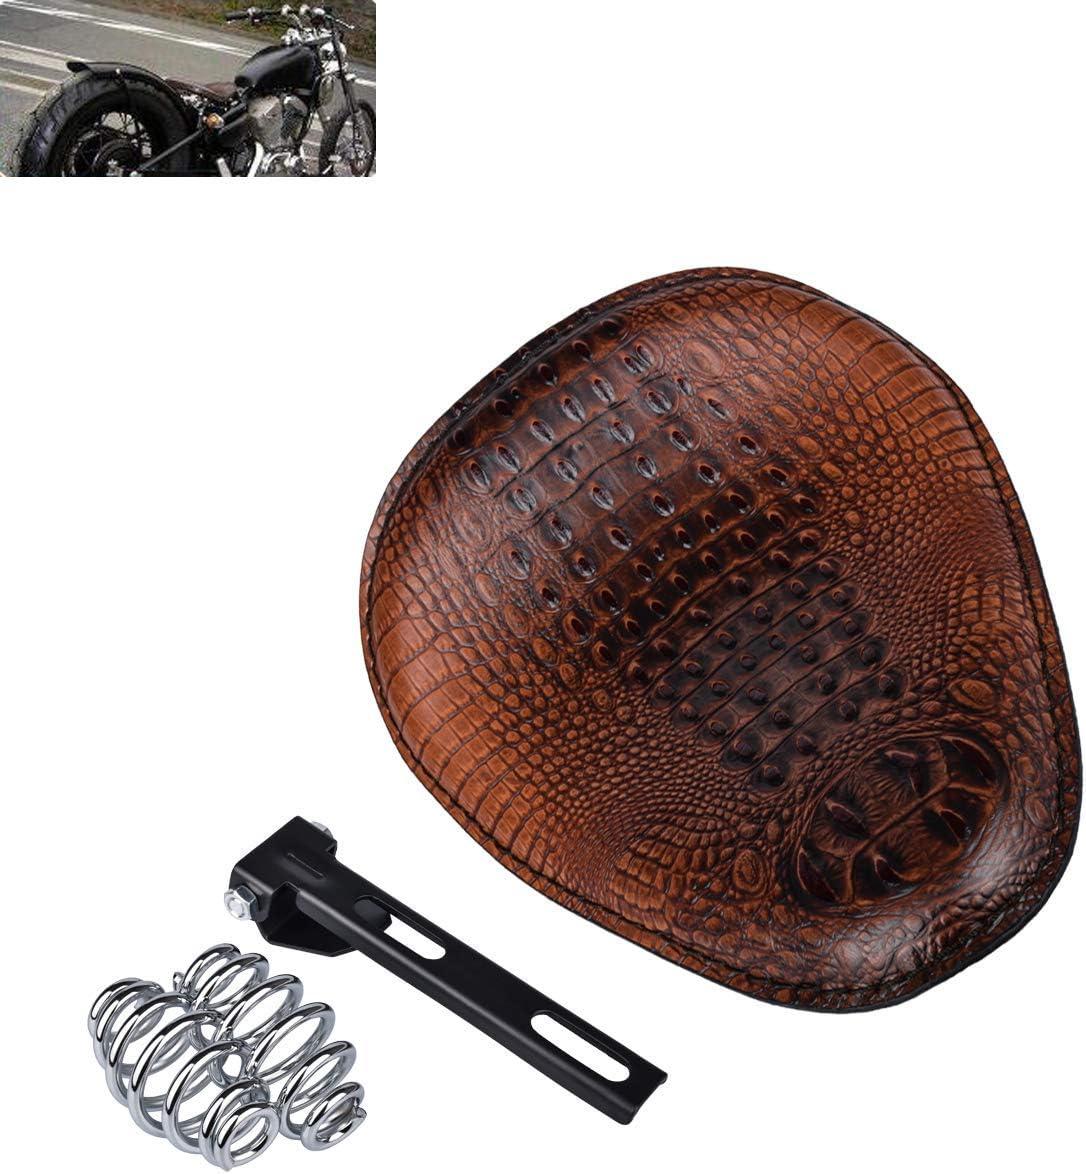 Coj/ín Universal de Piel de cocodrilo para sill/ín de Motocicleta Harley//Honda//Yamaha//Kawasaki marr/ón//Negro MeterMall